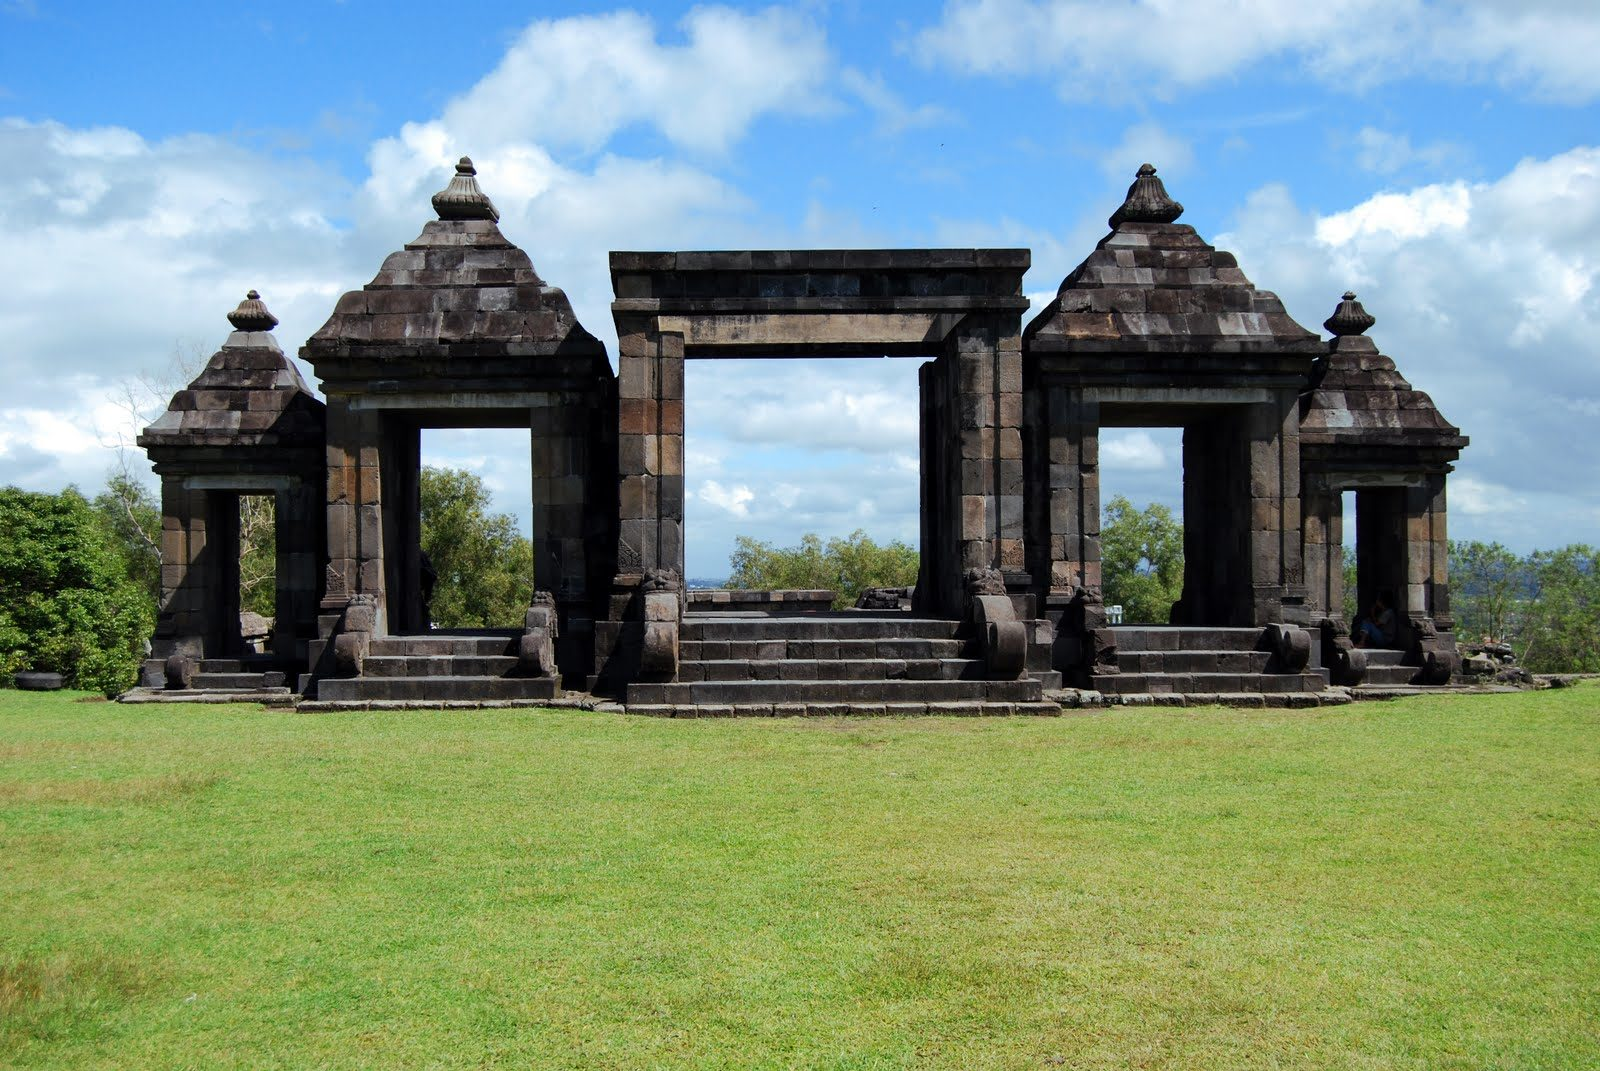 6 Obyek Wisata Budaya Jogja Yang Wajib Dikunjungi